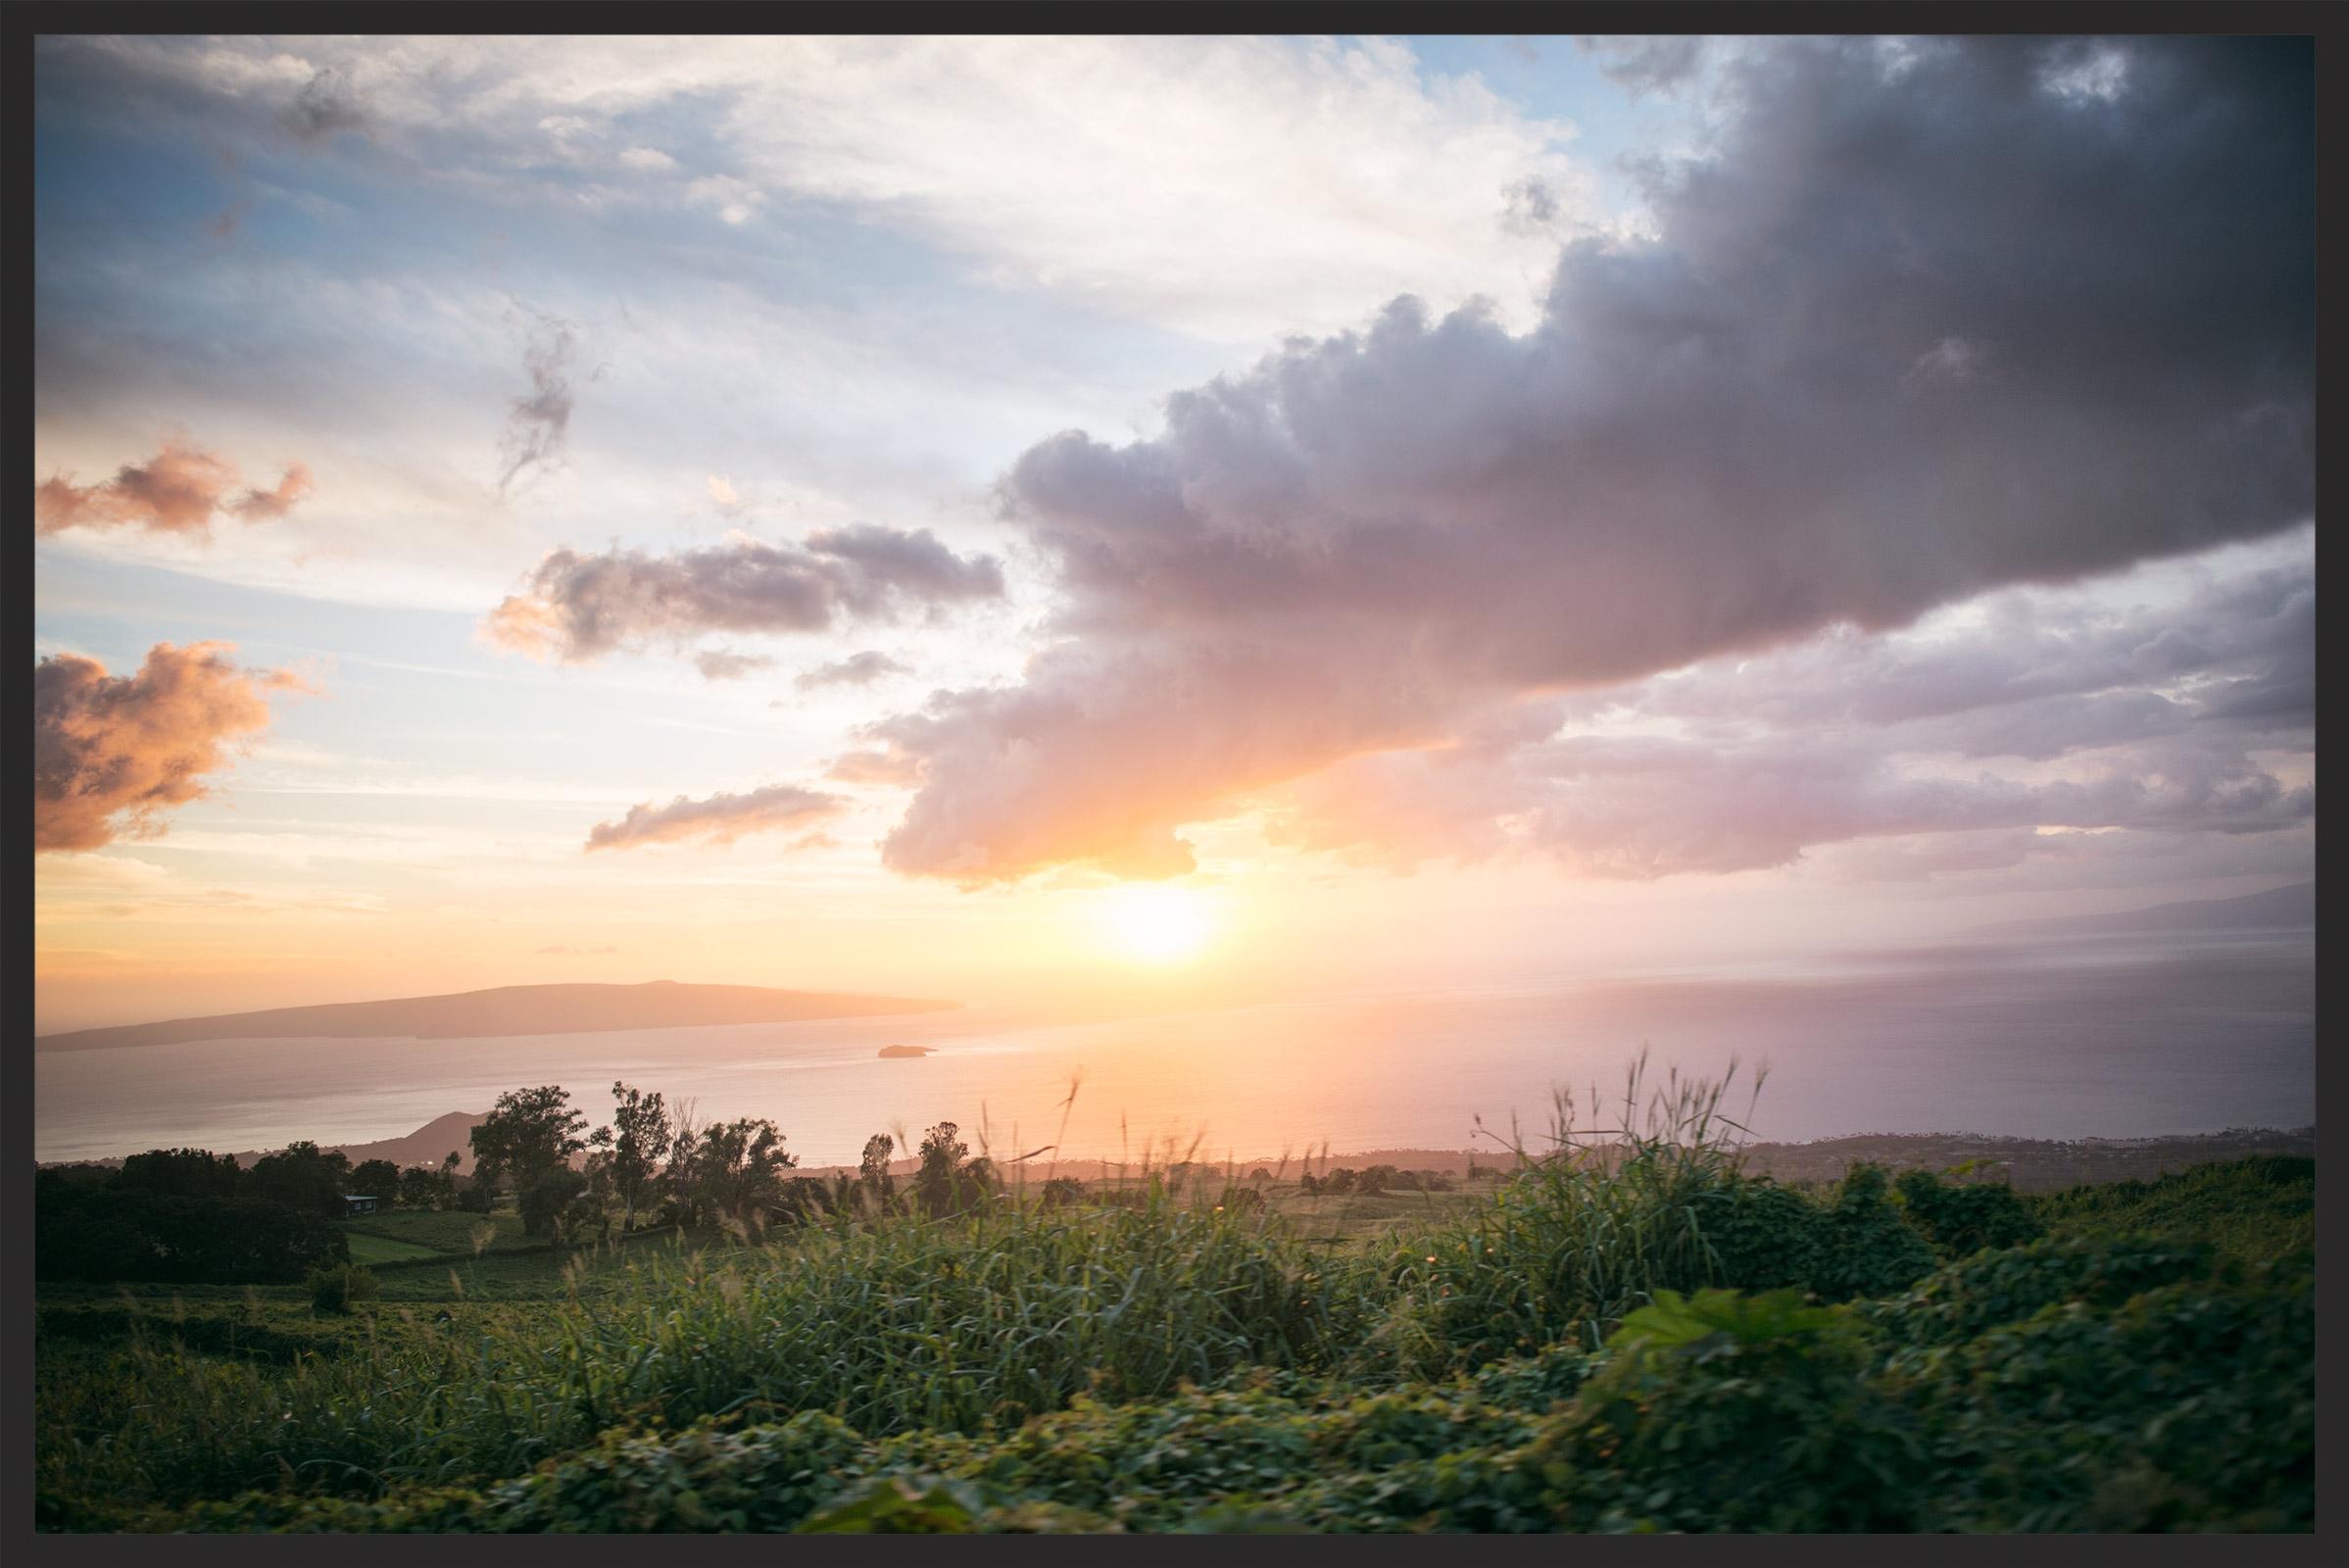 Sunset on Maui -by  Sharonlea Photography